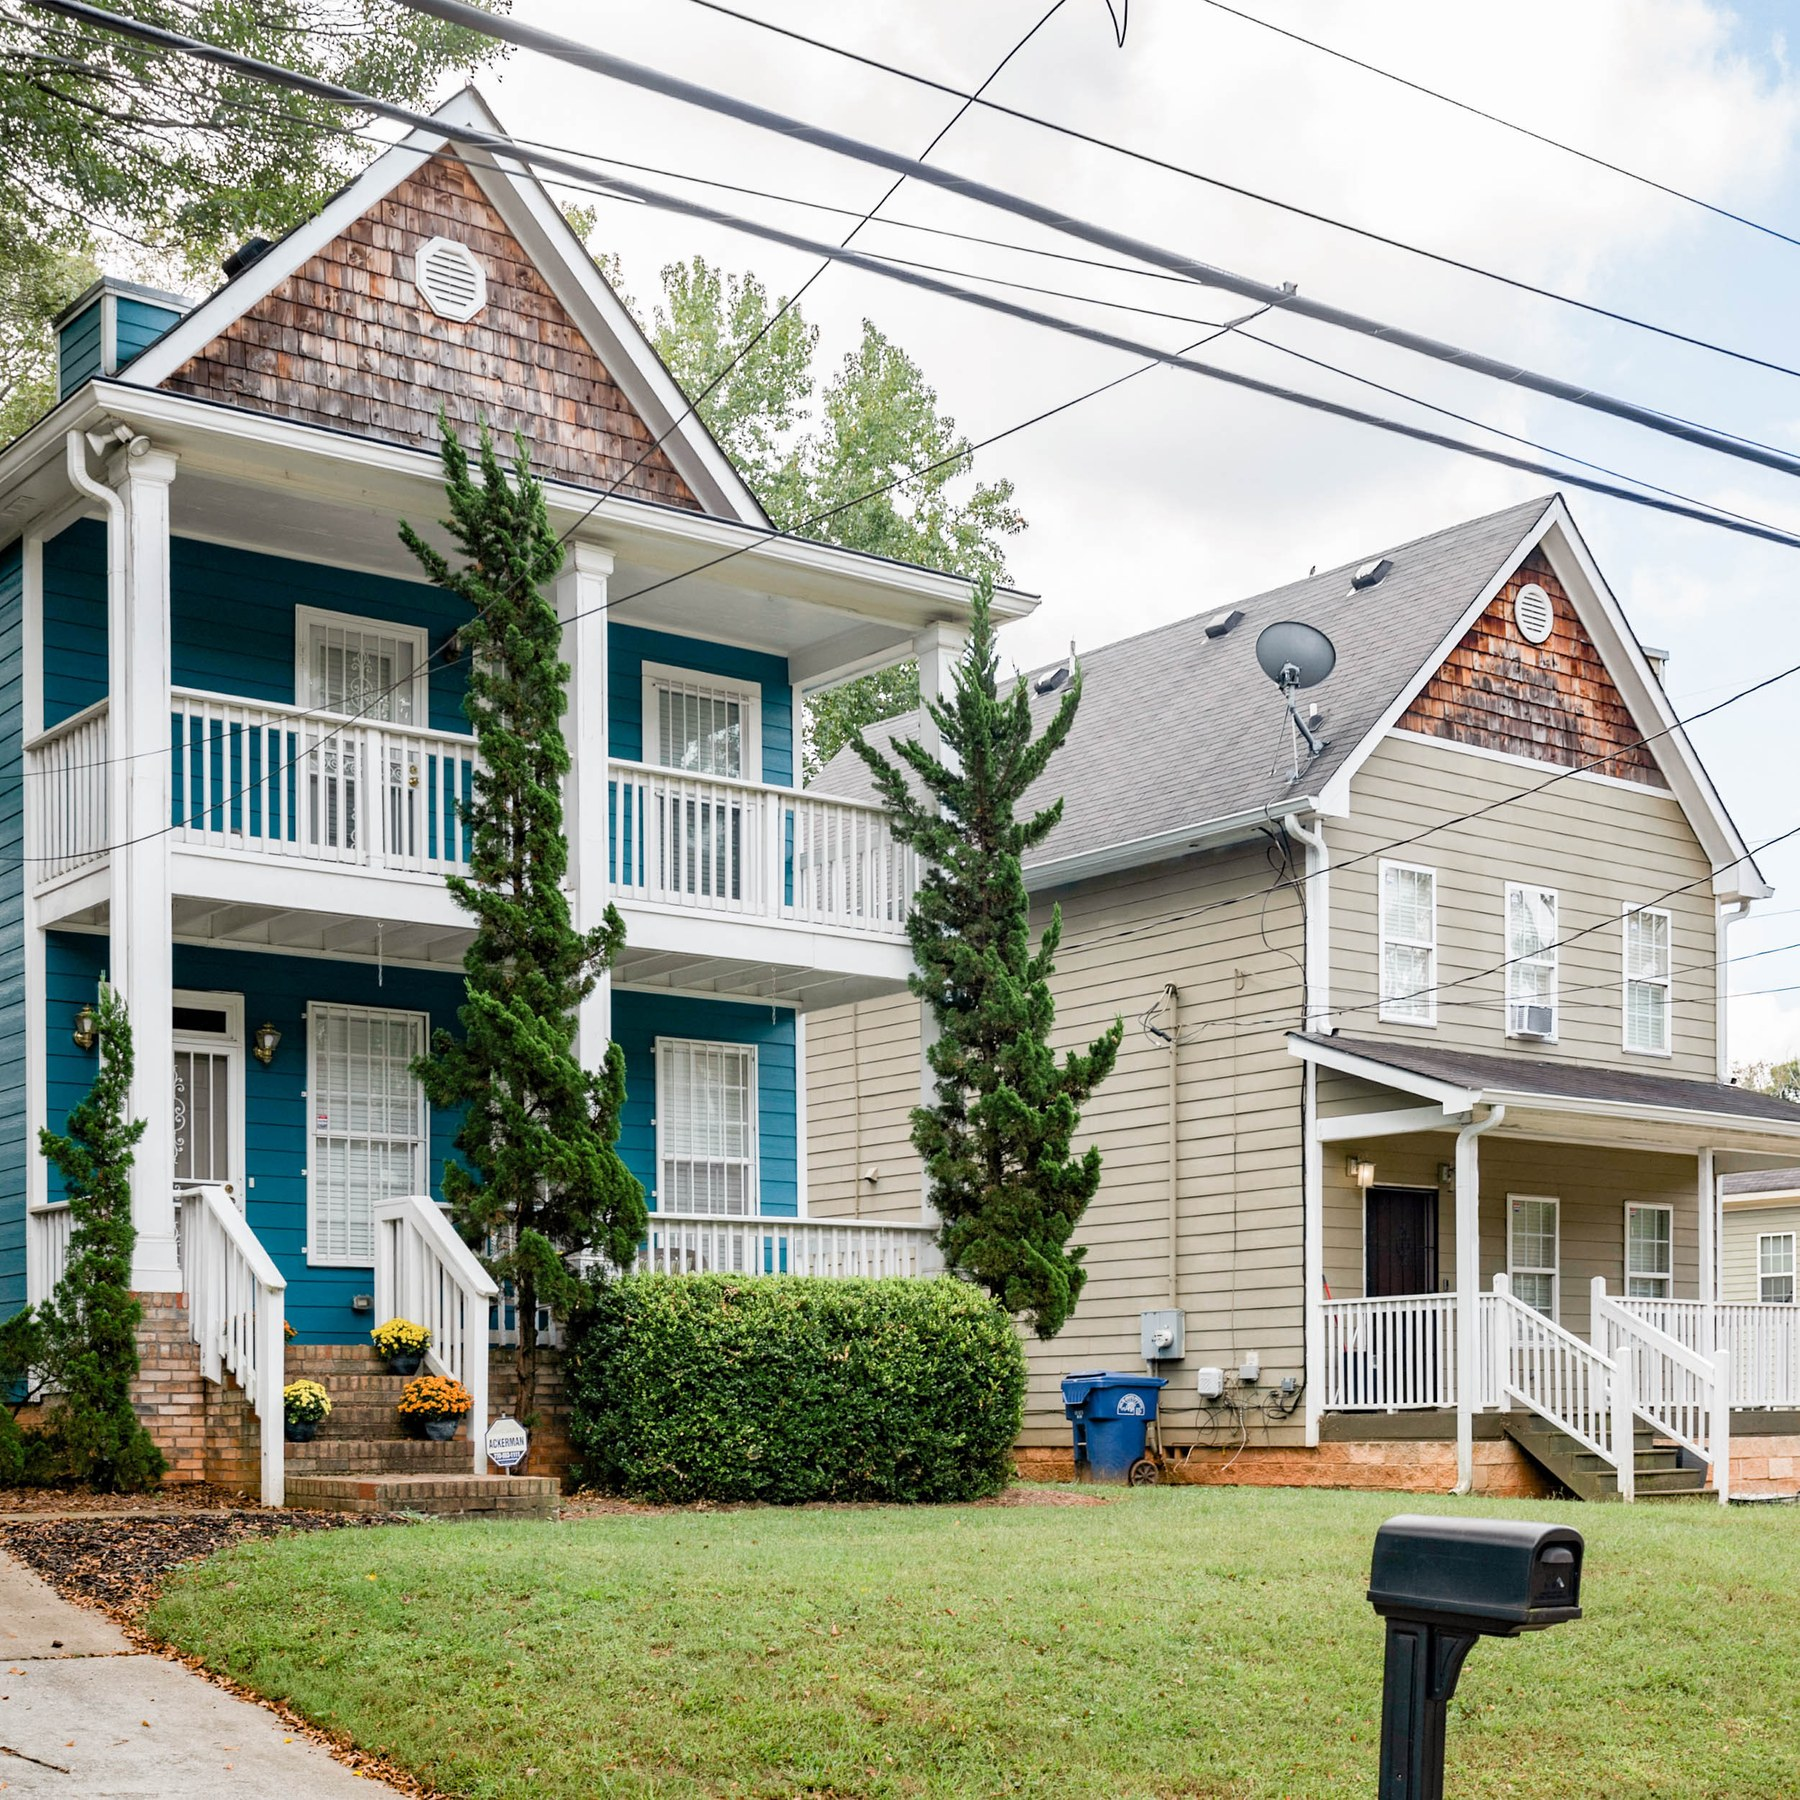 Local Com Homes For Rent: Pittsburgh, Atlanta GA - Neighborhood Guide